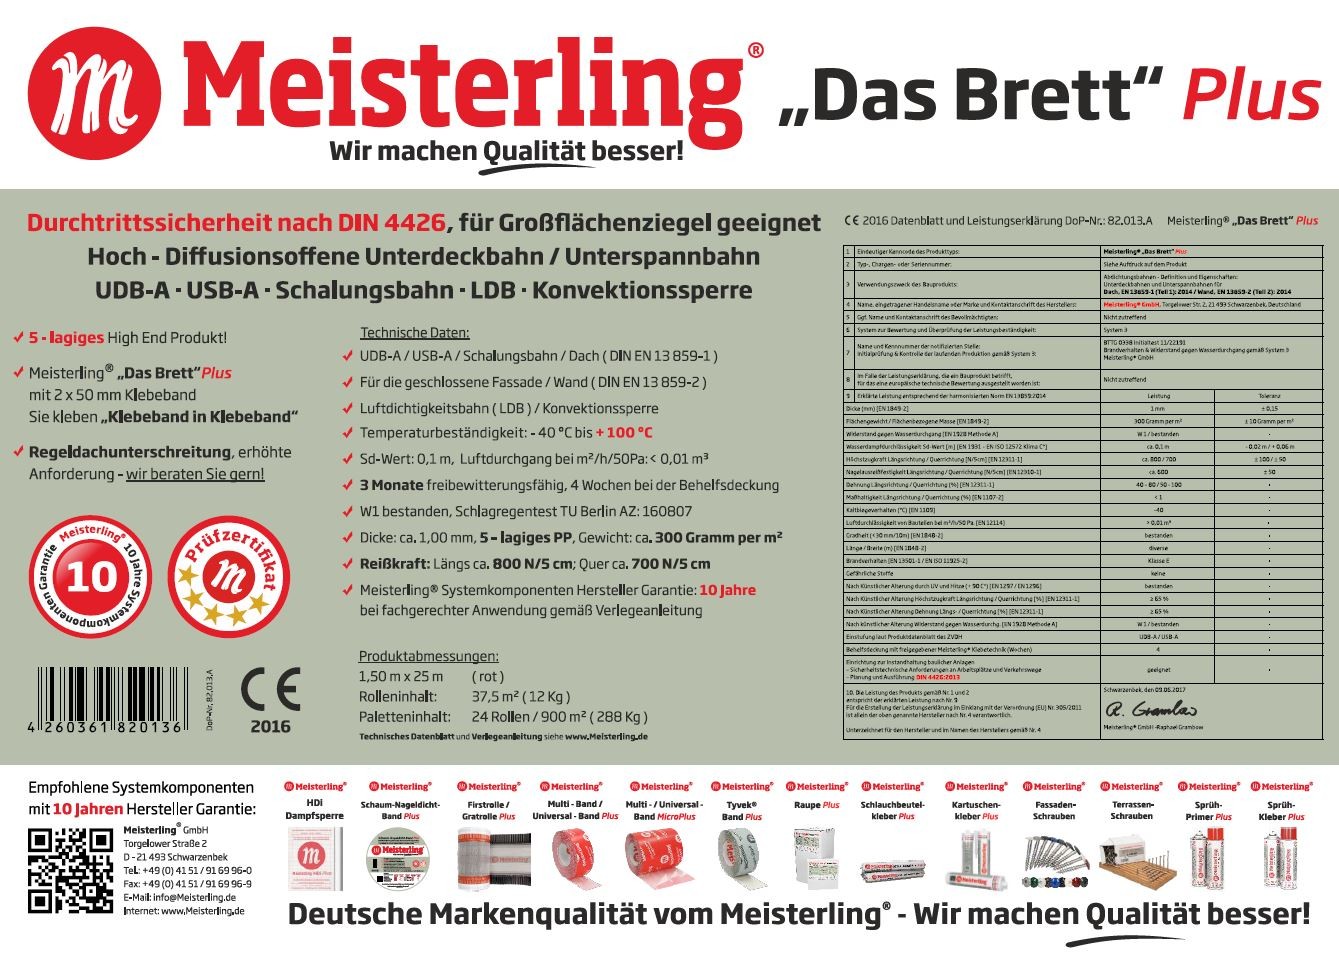 Meisterling®